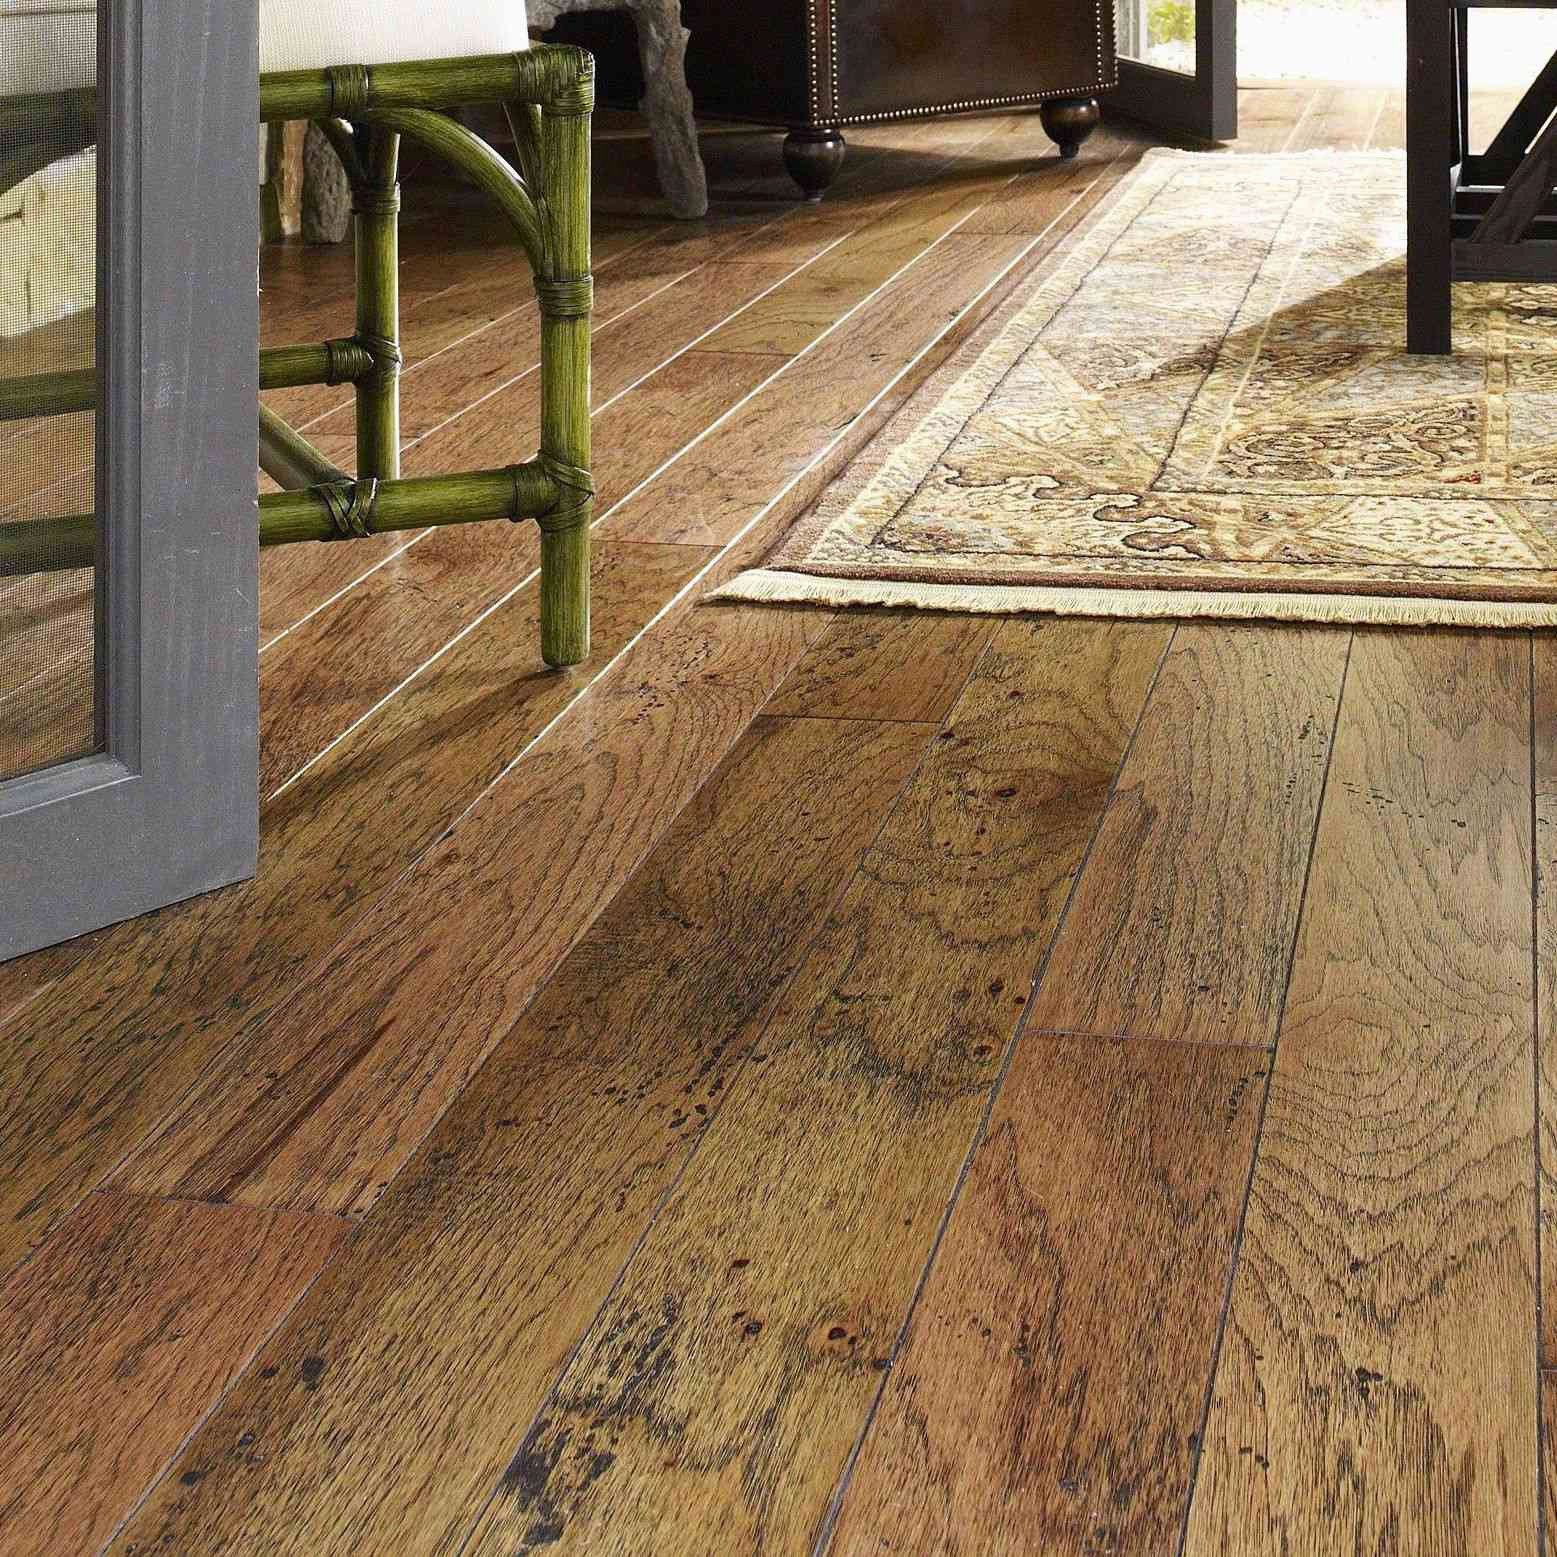 16 Nice Cheap 3 4 Hardwood Flooring 2021 free download cheap 3 4 hardwood flooring of hardwood floor wood floor plan ideas throughout 20 photos of the hardwood floor wood